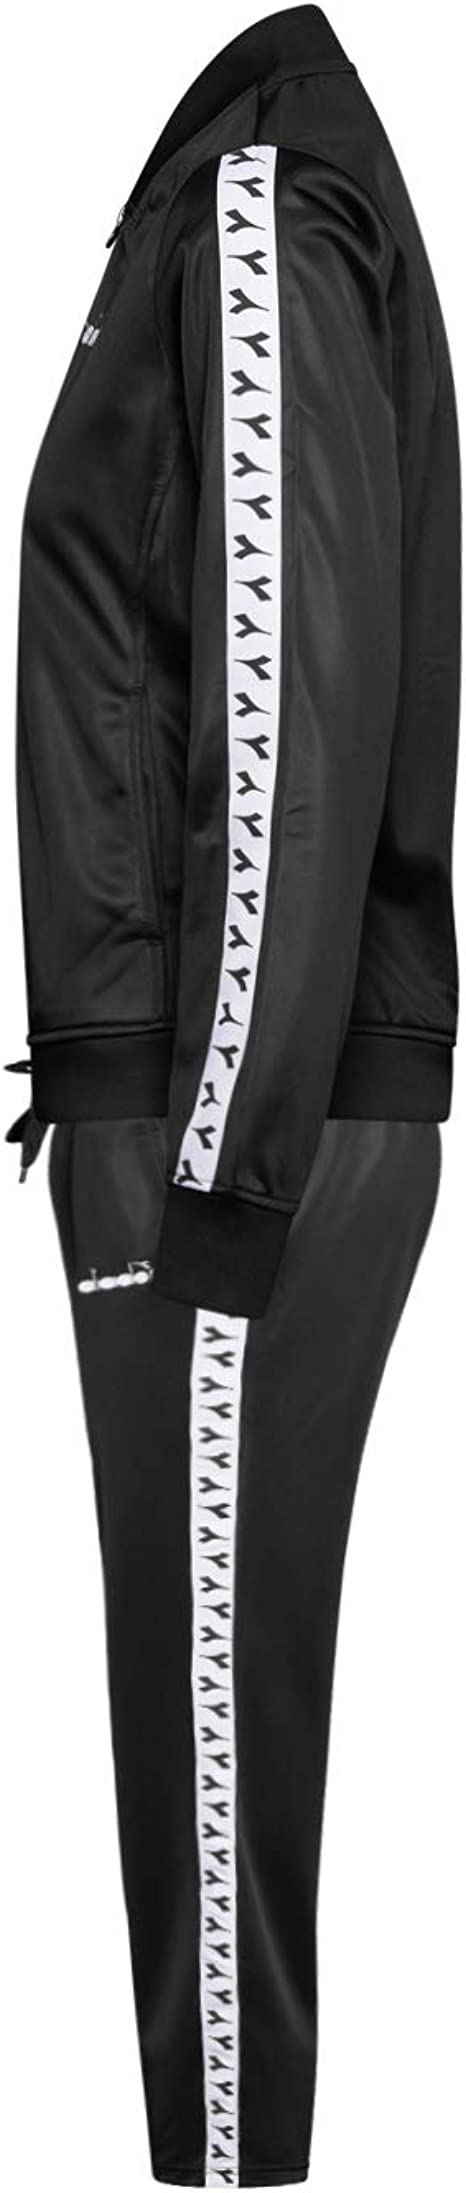 Tuta L.Suit CHROMIA II per Donna Diadora